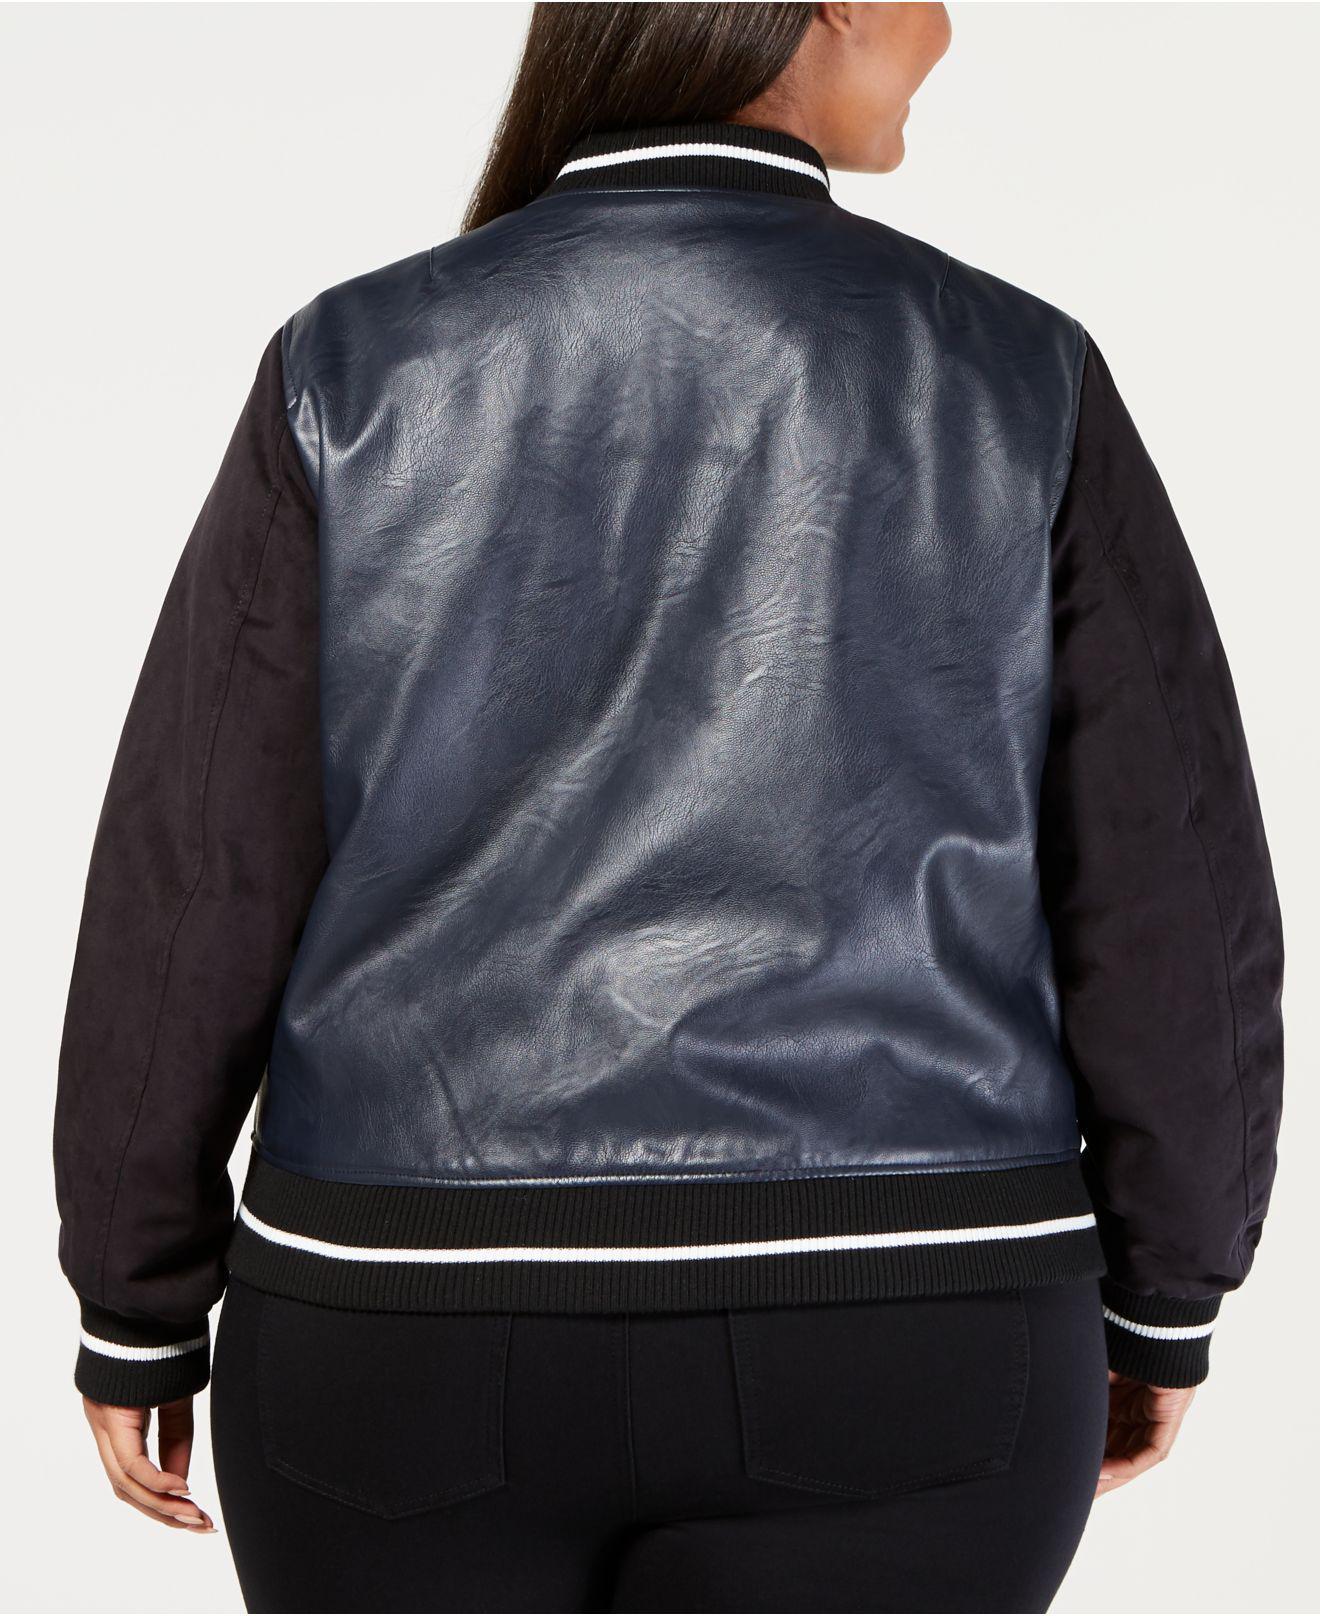 d9cd36b10d8 Lyst - Levi s ® Plus Size Faux-leather Varsity Bomber Jacket